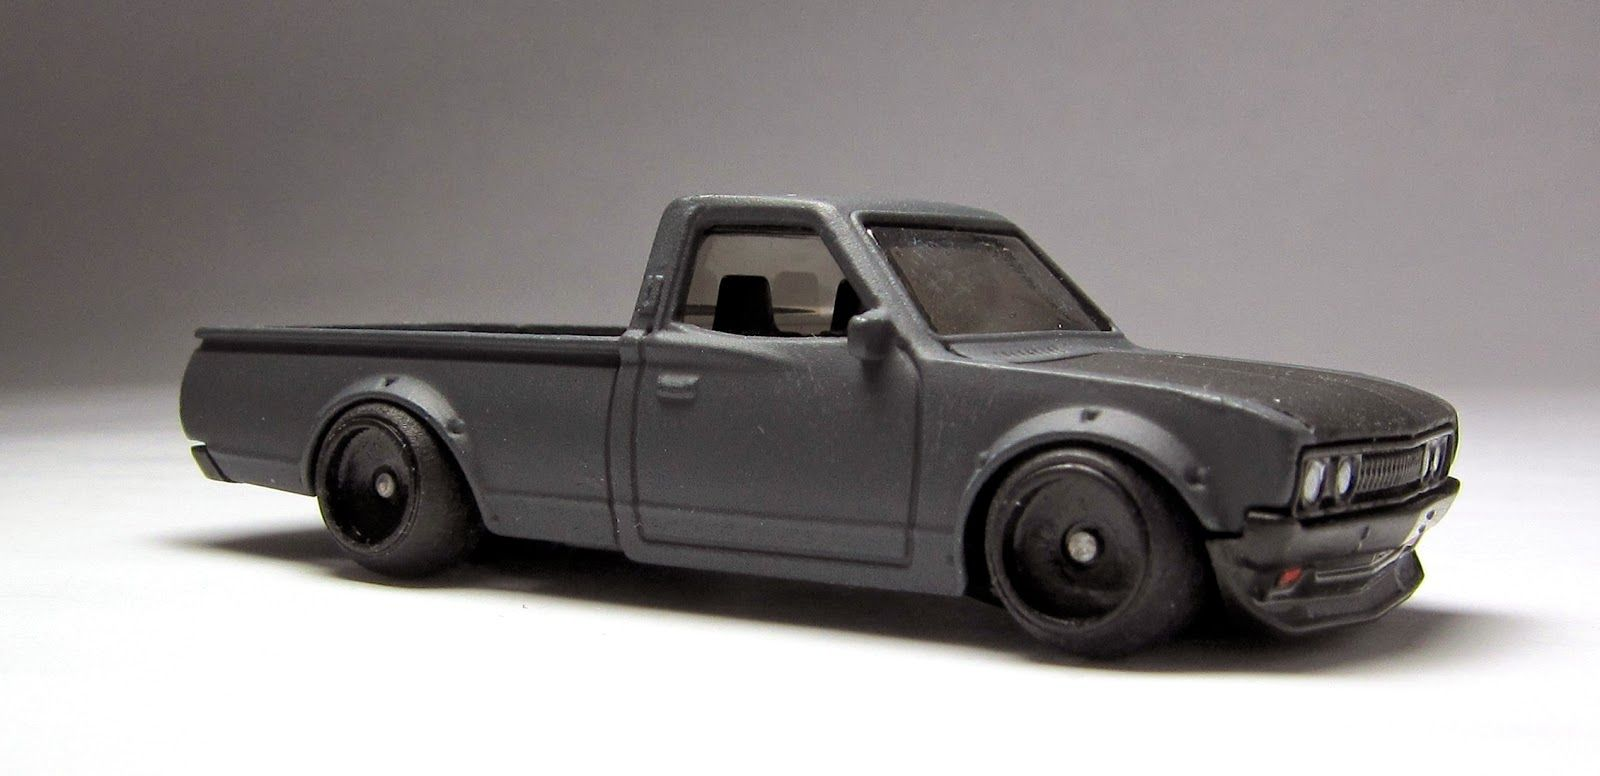 the Lamley Group: Lamley Customs: Chris Huntley's Datsun ...